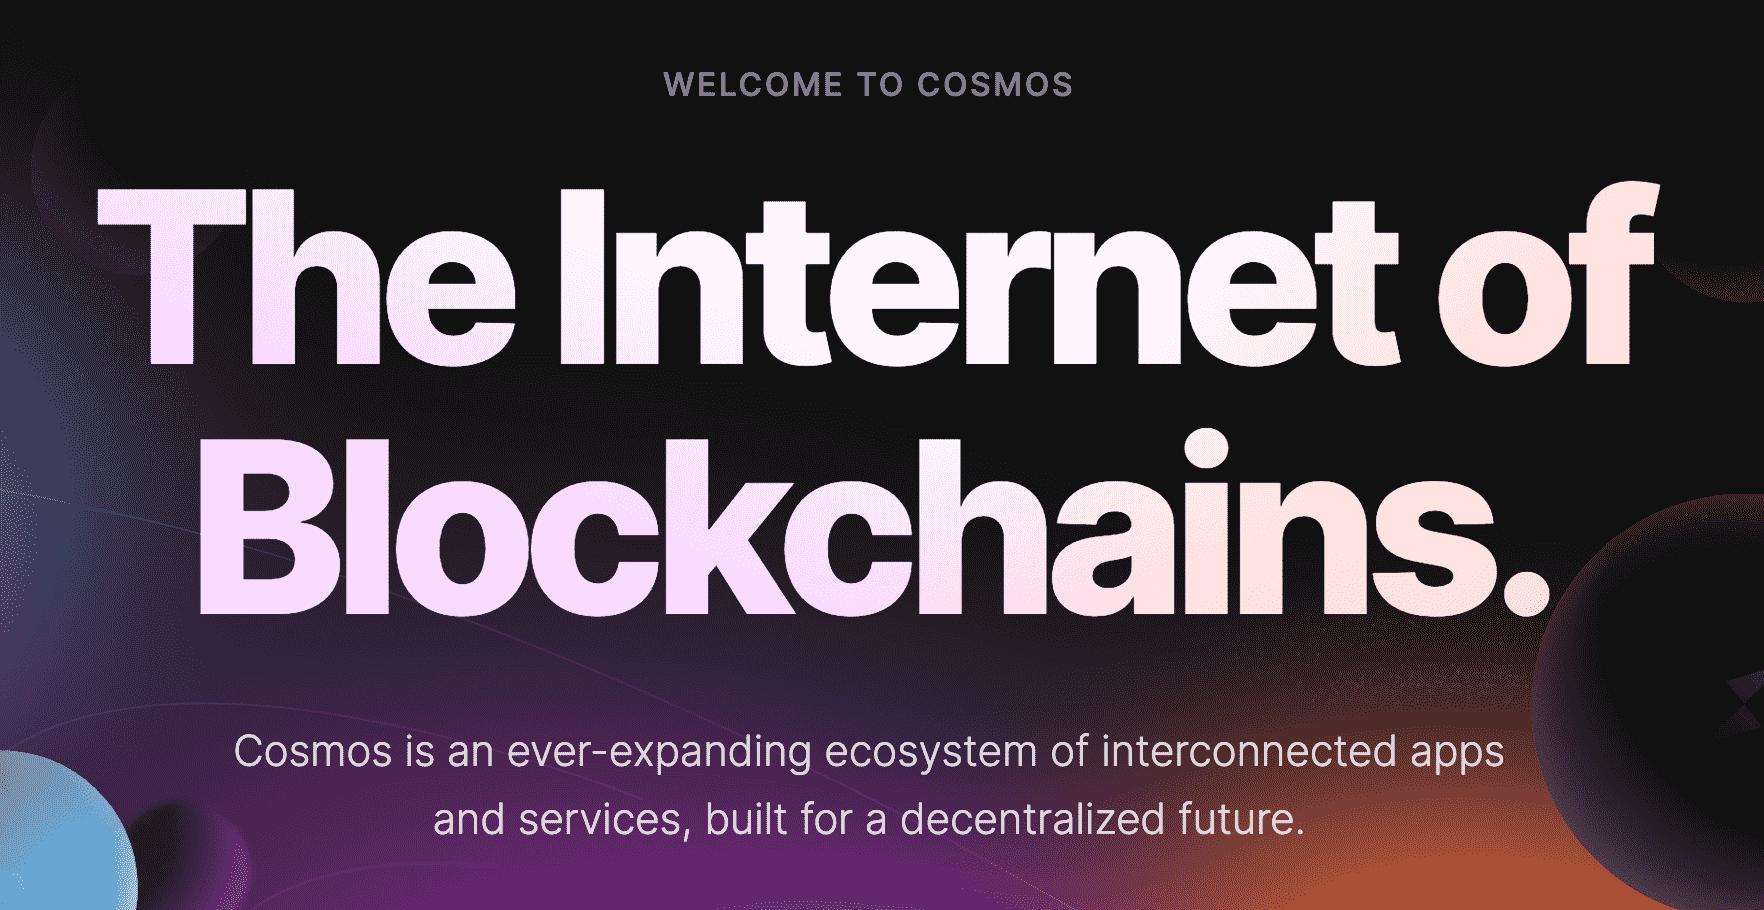 COSMOS ecosystem